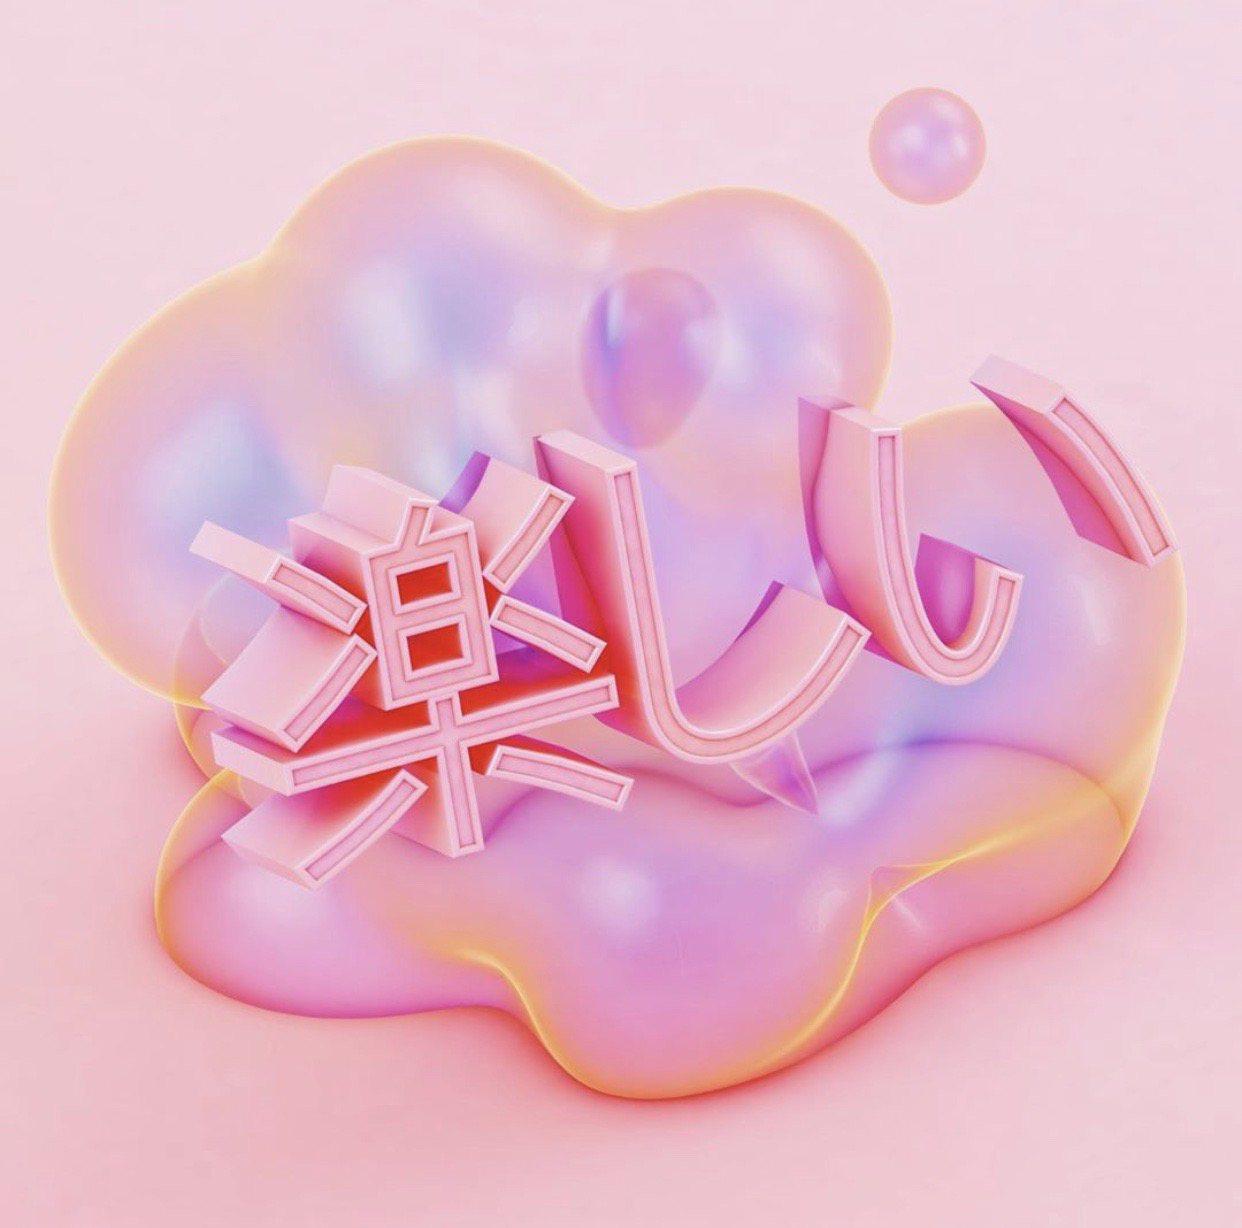 3d blob text design by 3d avatar designs by Amrit Pal Singh